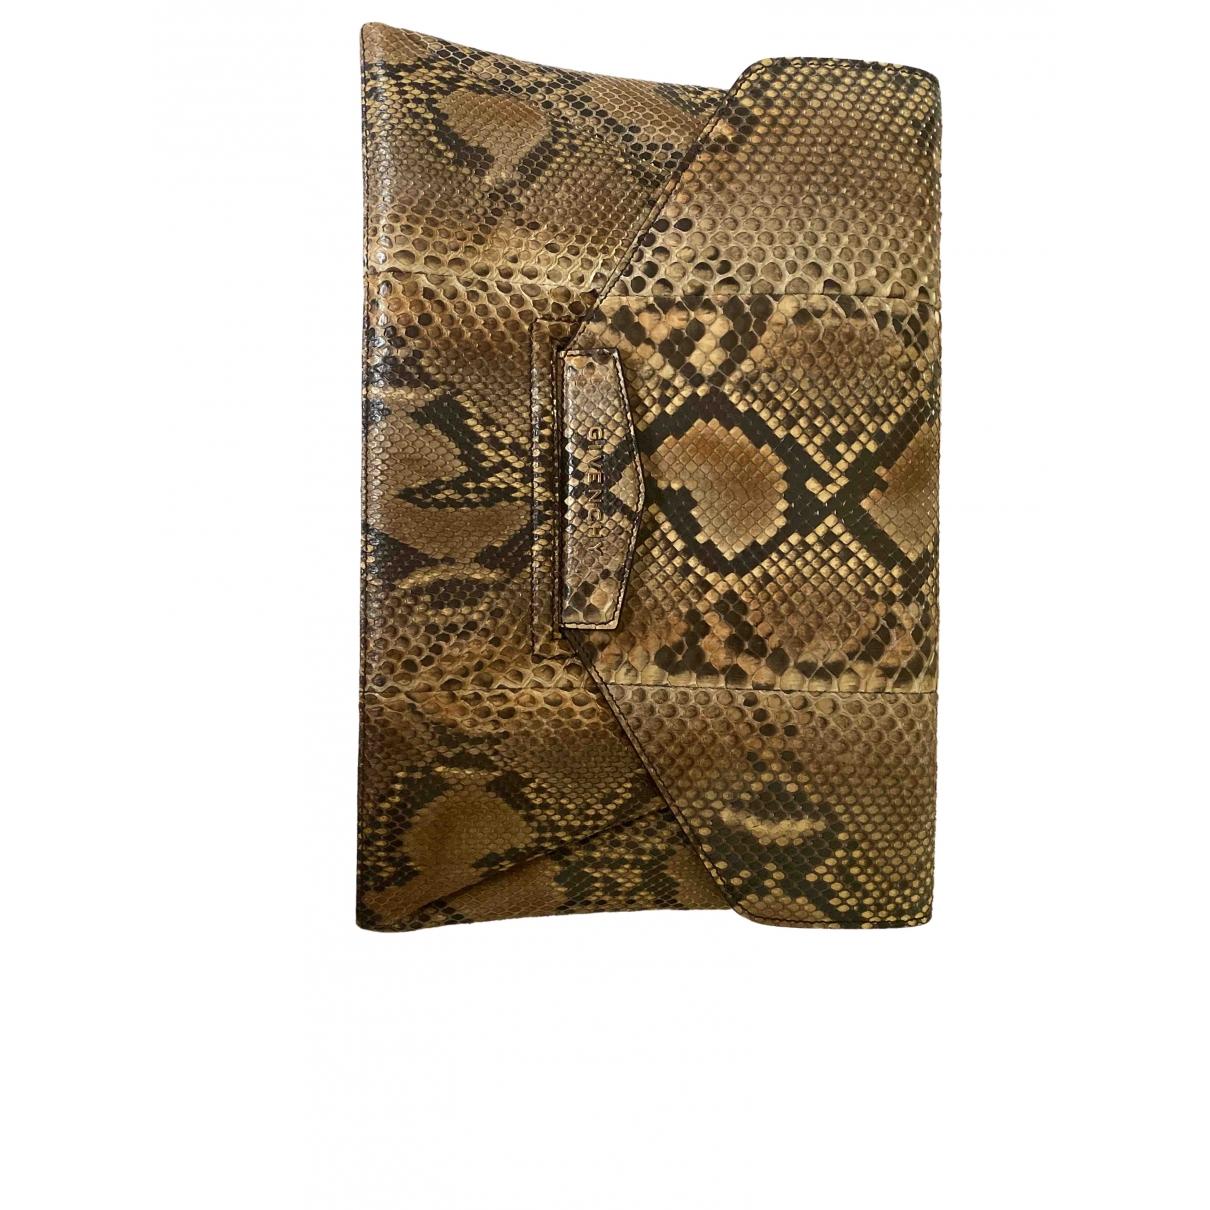 Givenchy Antigona Clutch in  Beige Python